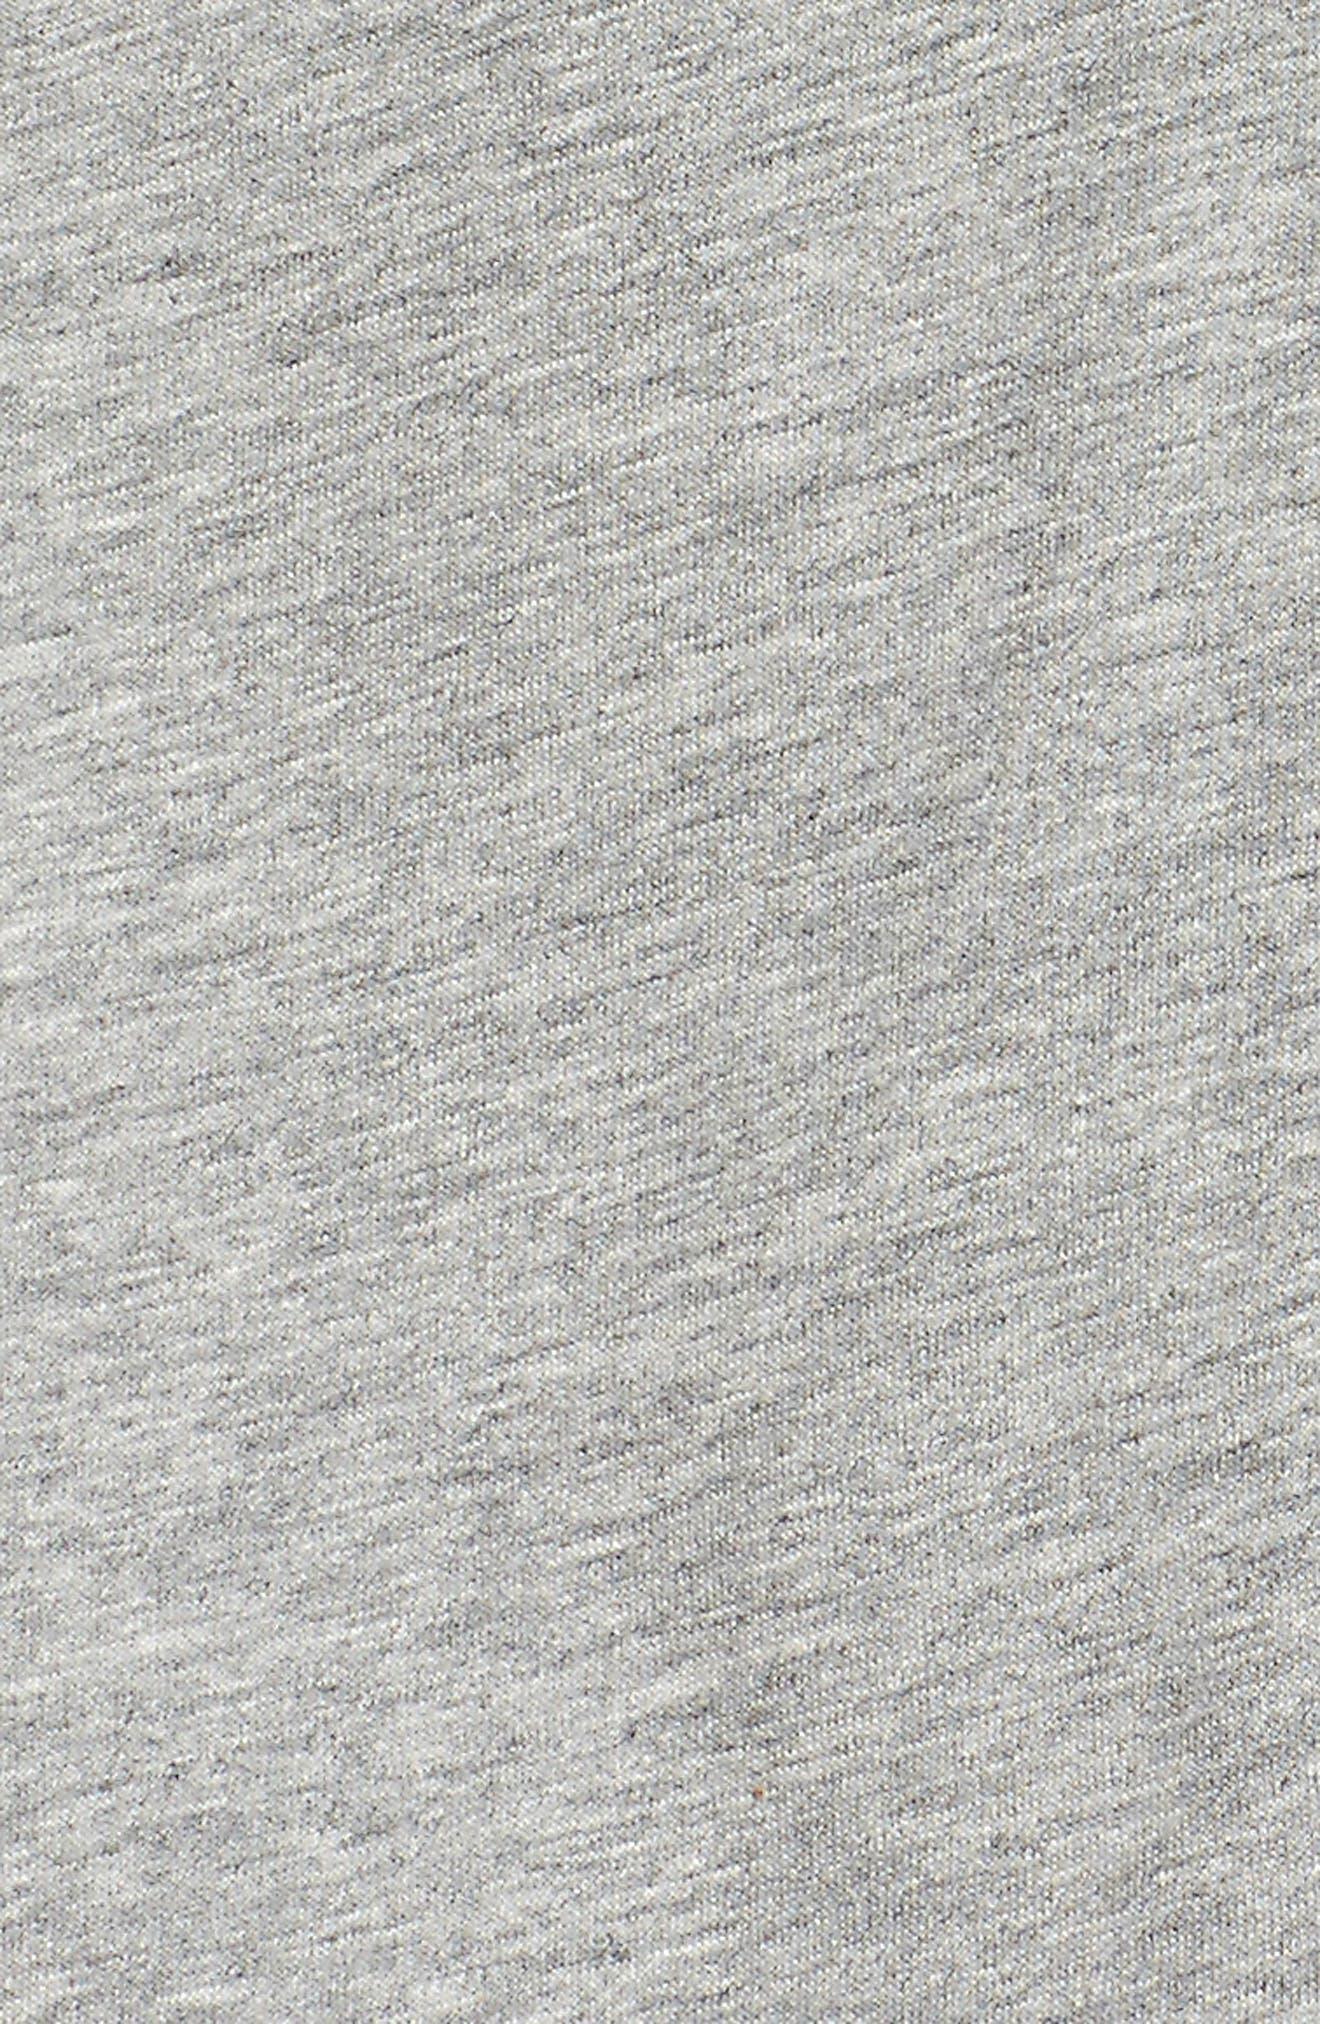 Court Tennis Hoodie,                             Alternate thumbnail 6, color,                             Dark Grey/ Black/ White